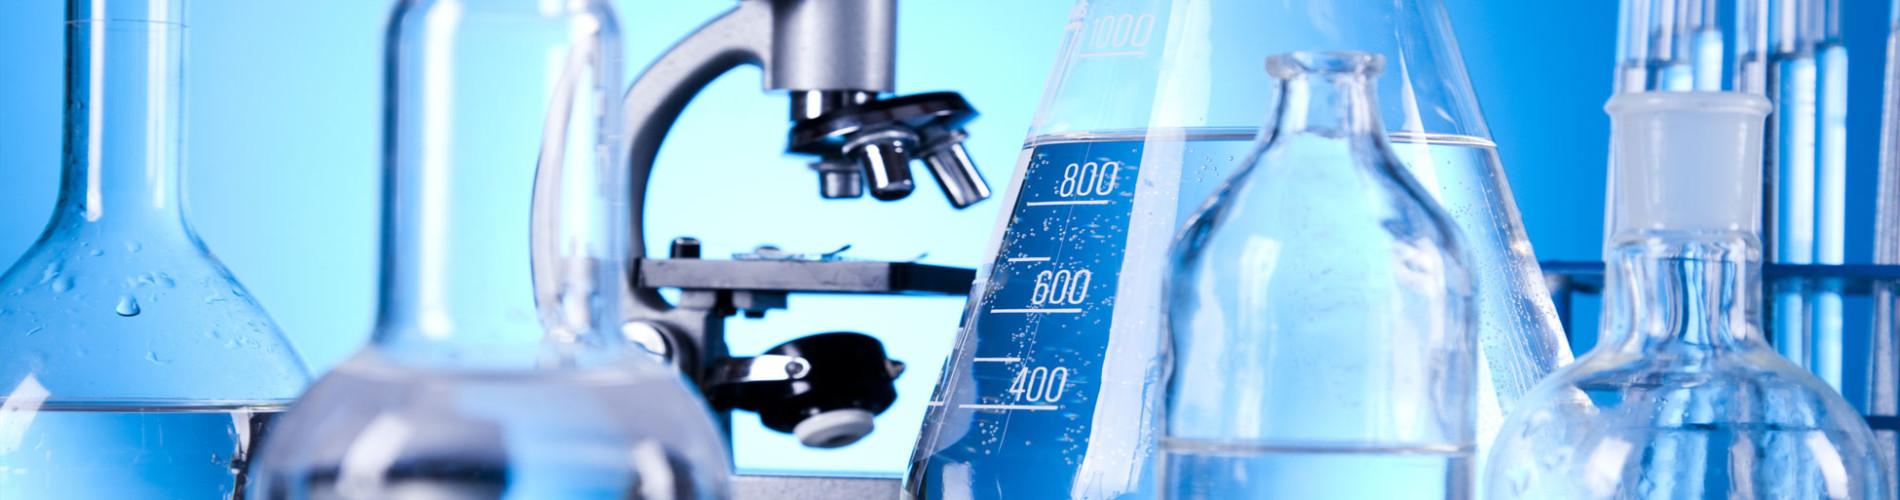 Medical Lab Equipment